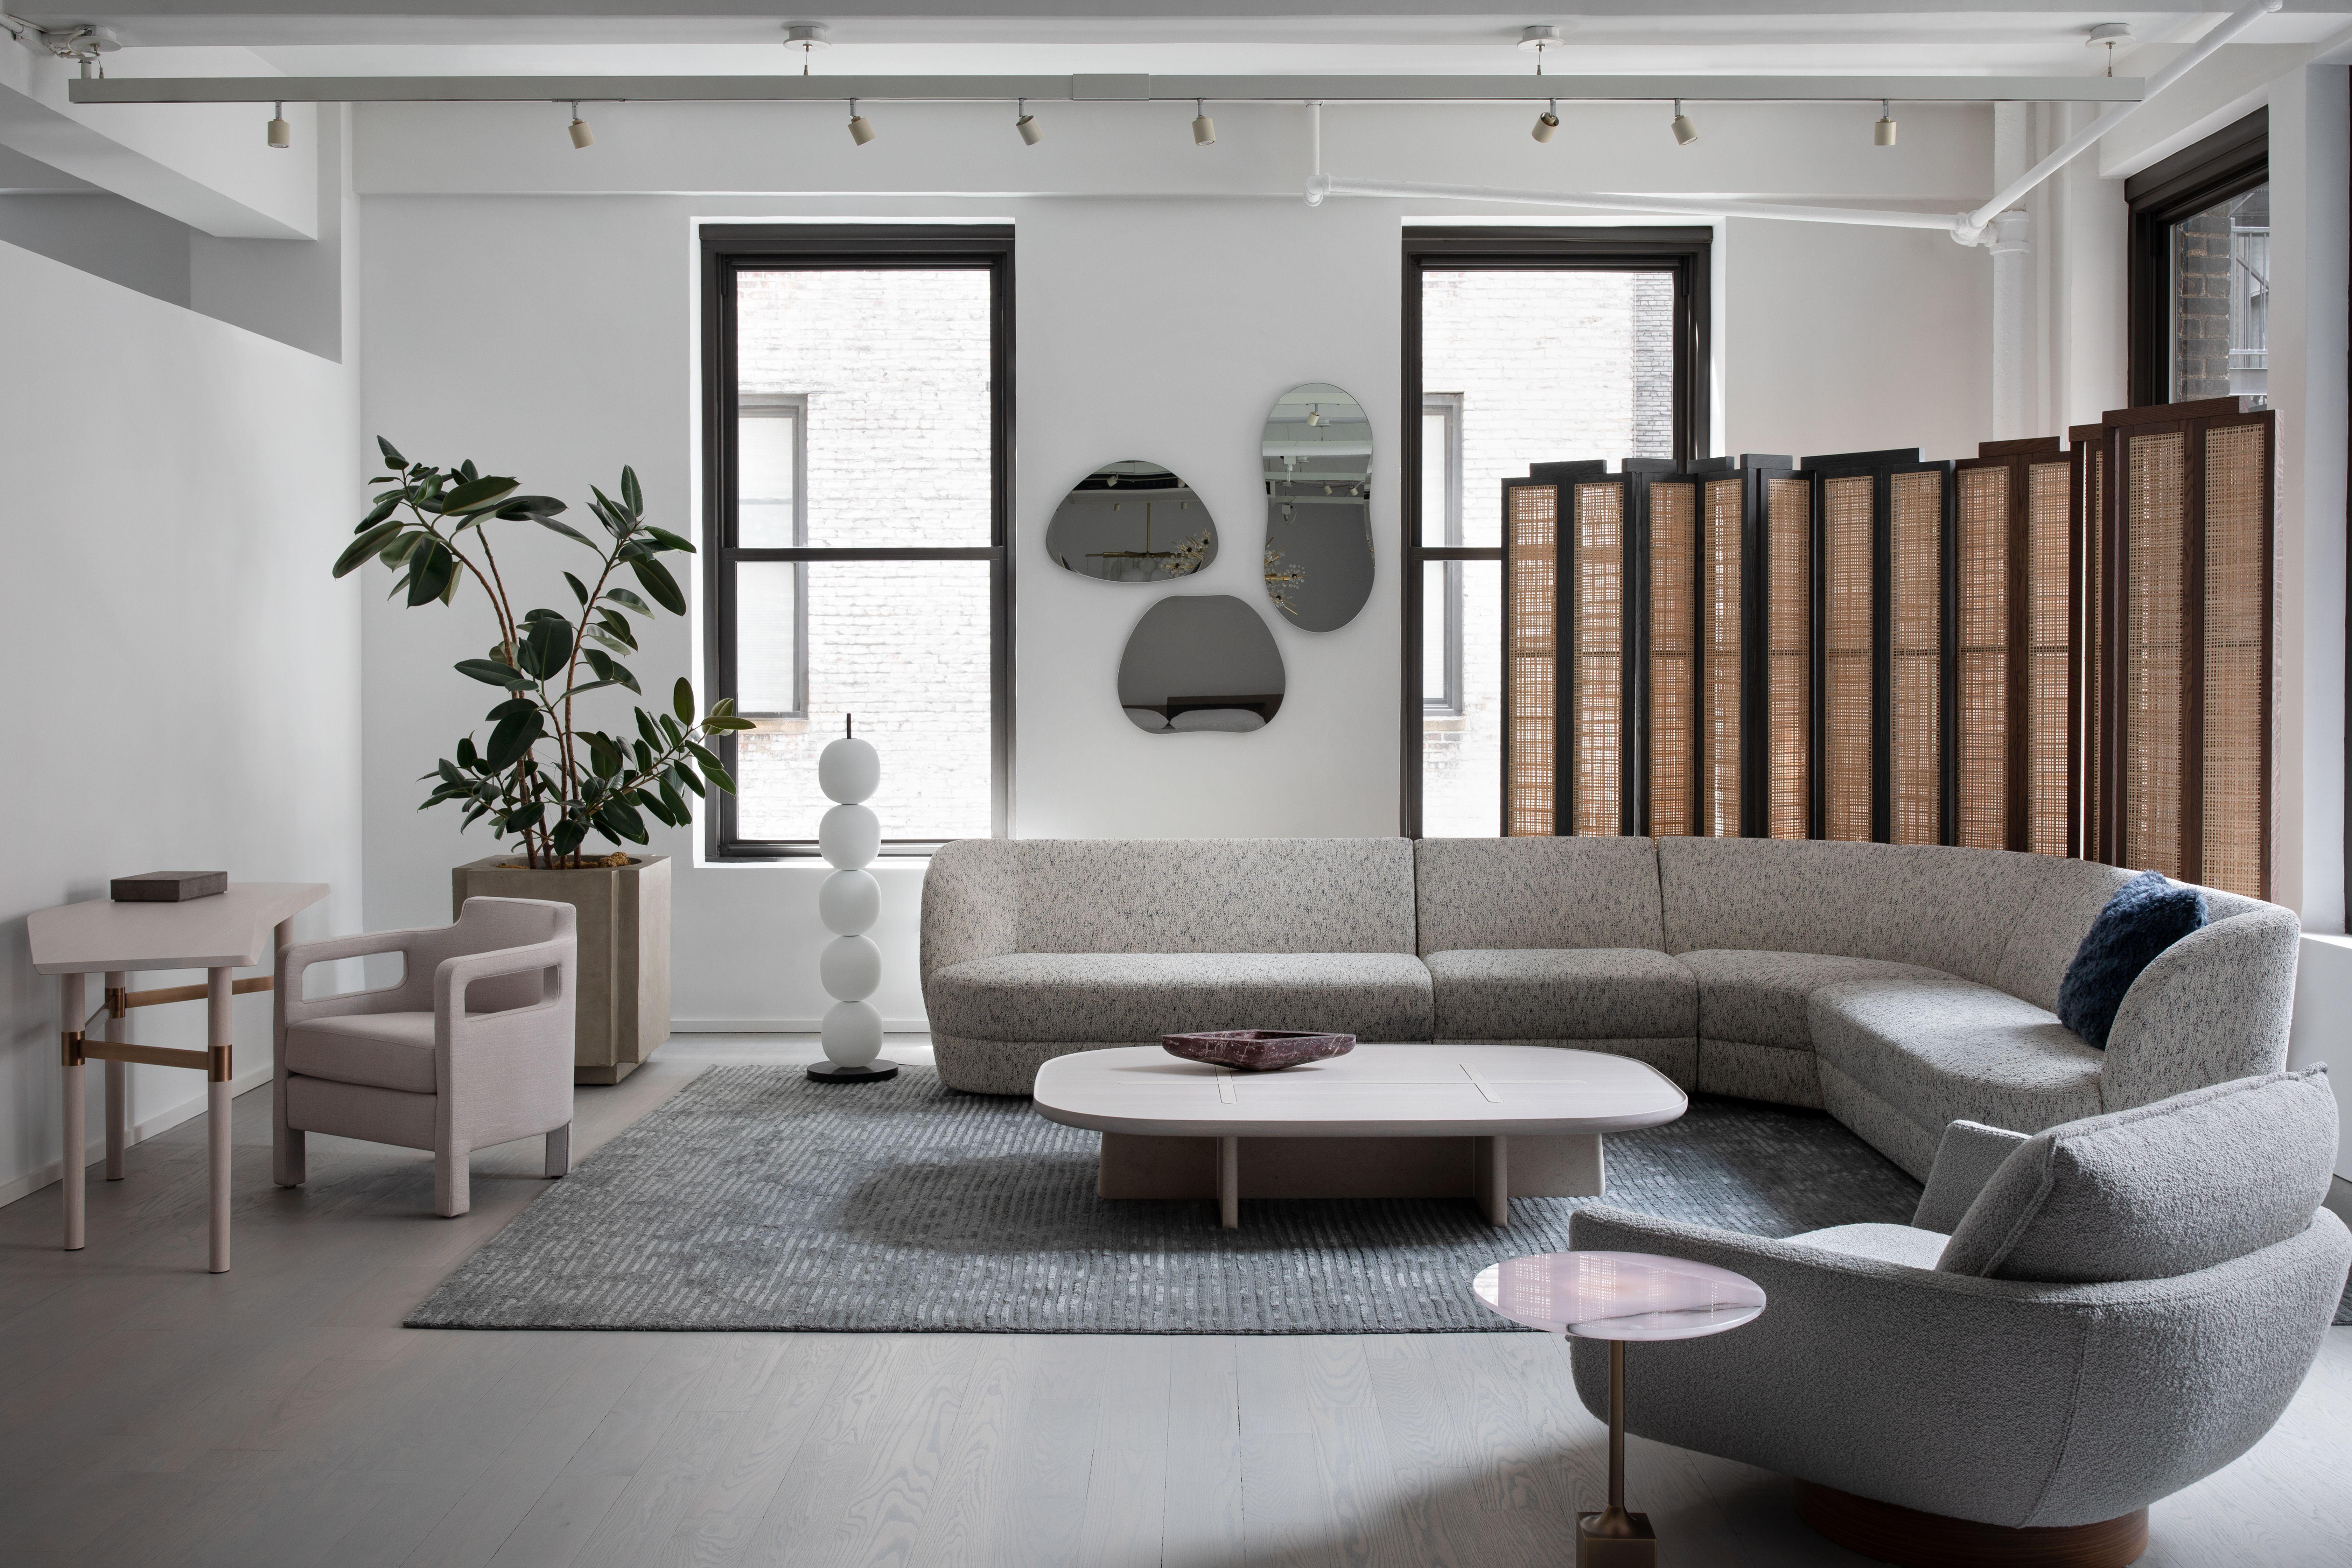 Avenue Road New York Showroom Furniture Homedecor Design